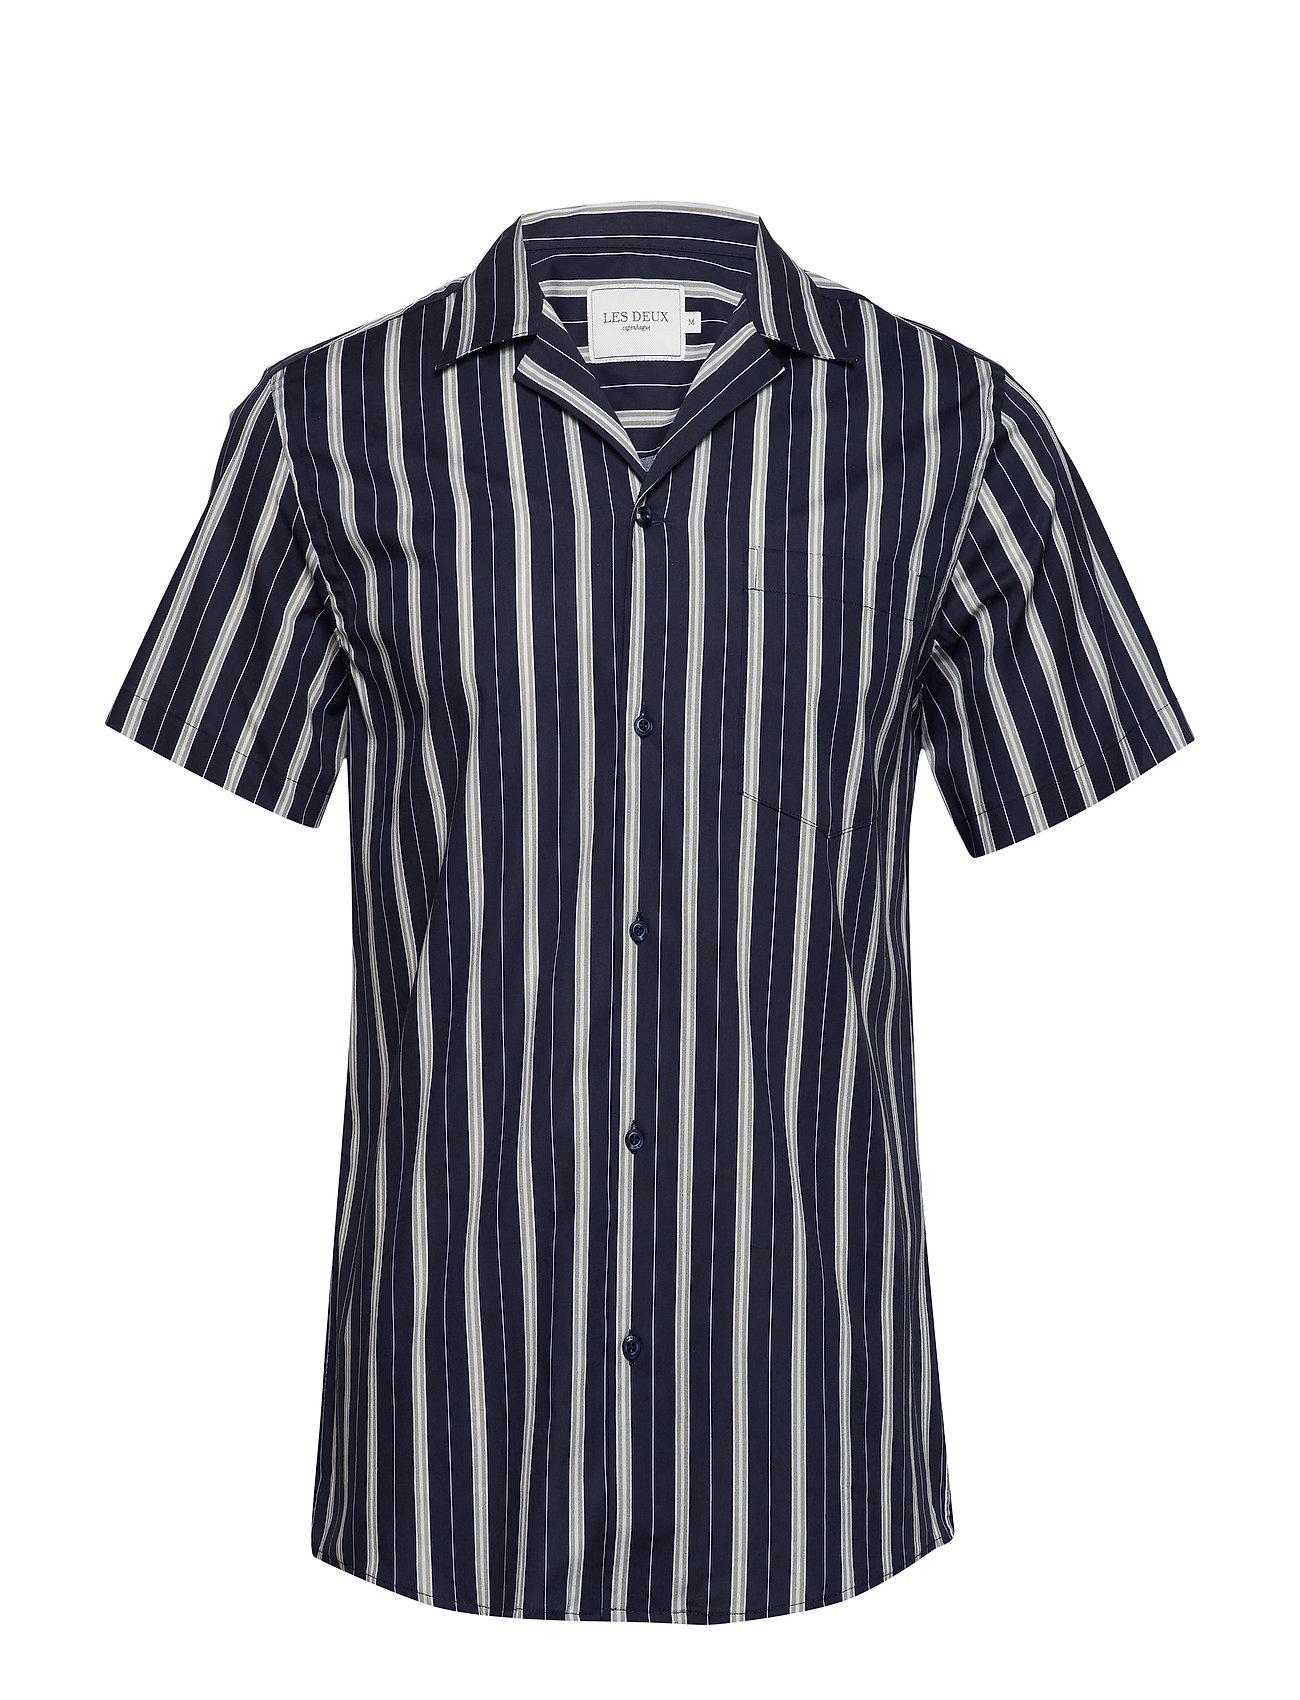 Les Deux Manny Shirt - DARK NAVY